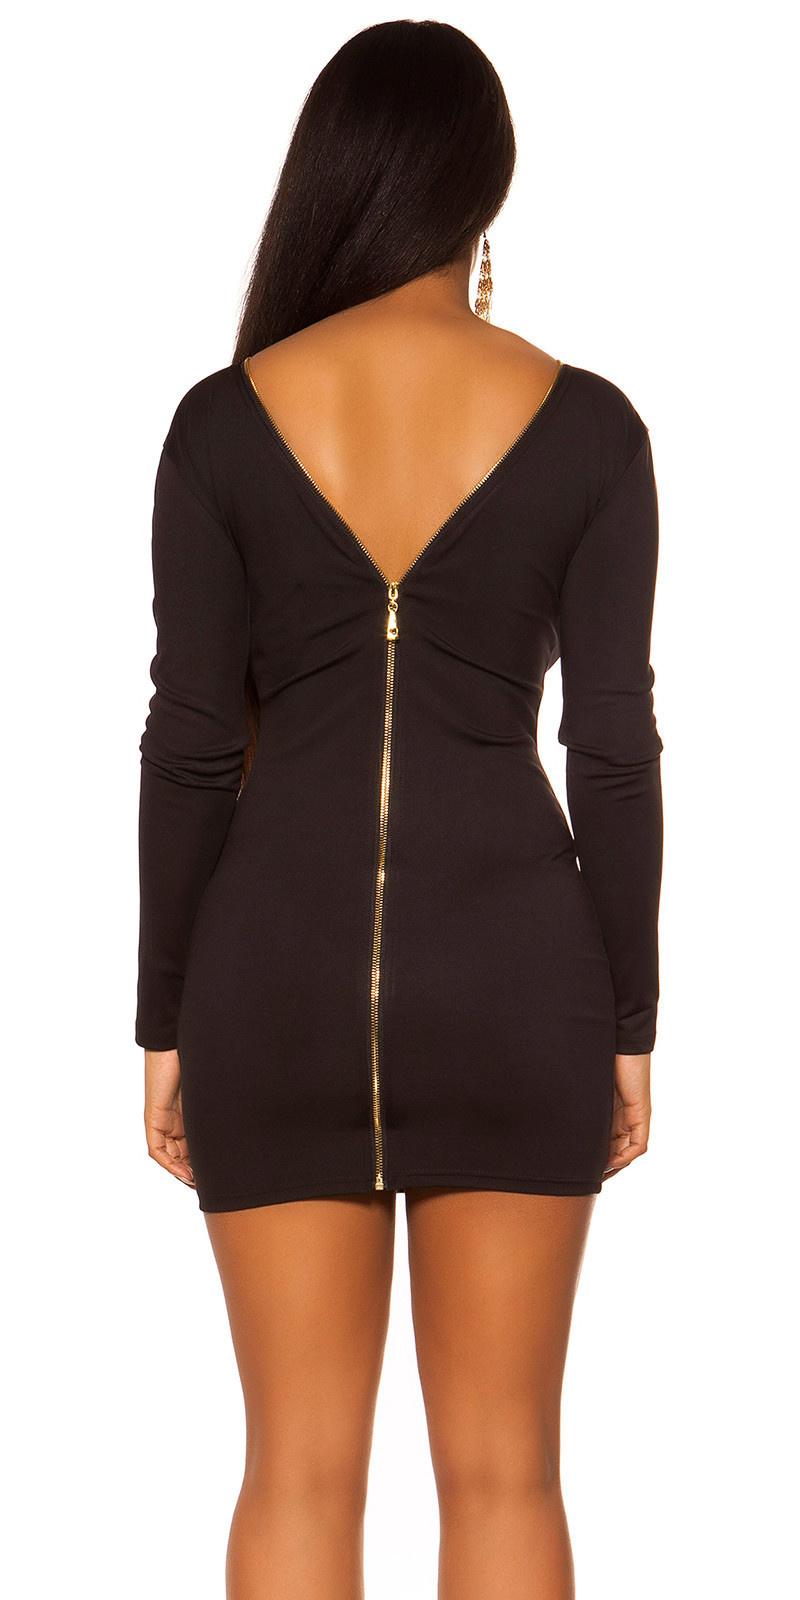 Sexy KouCla Sheath Dress with back zipper Black